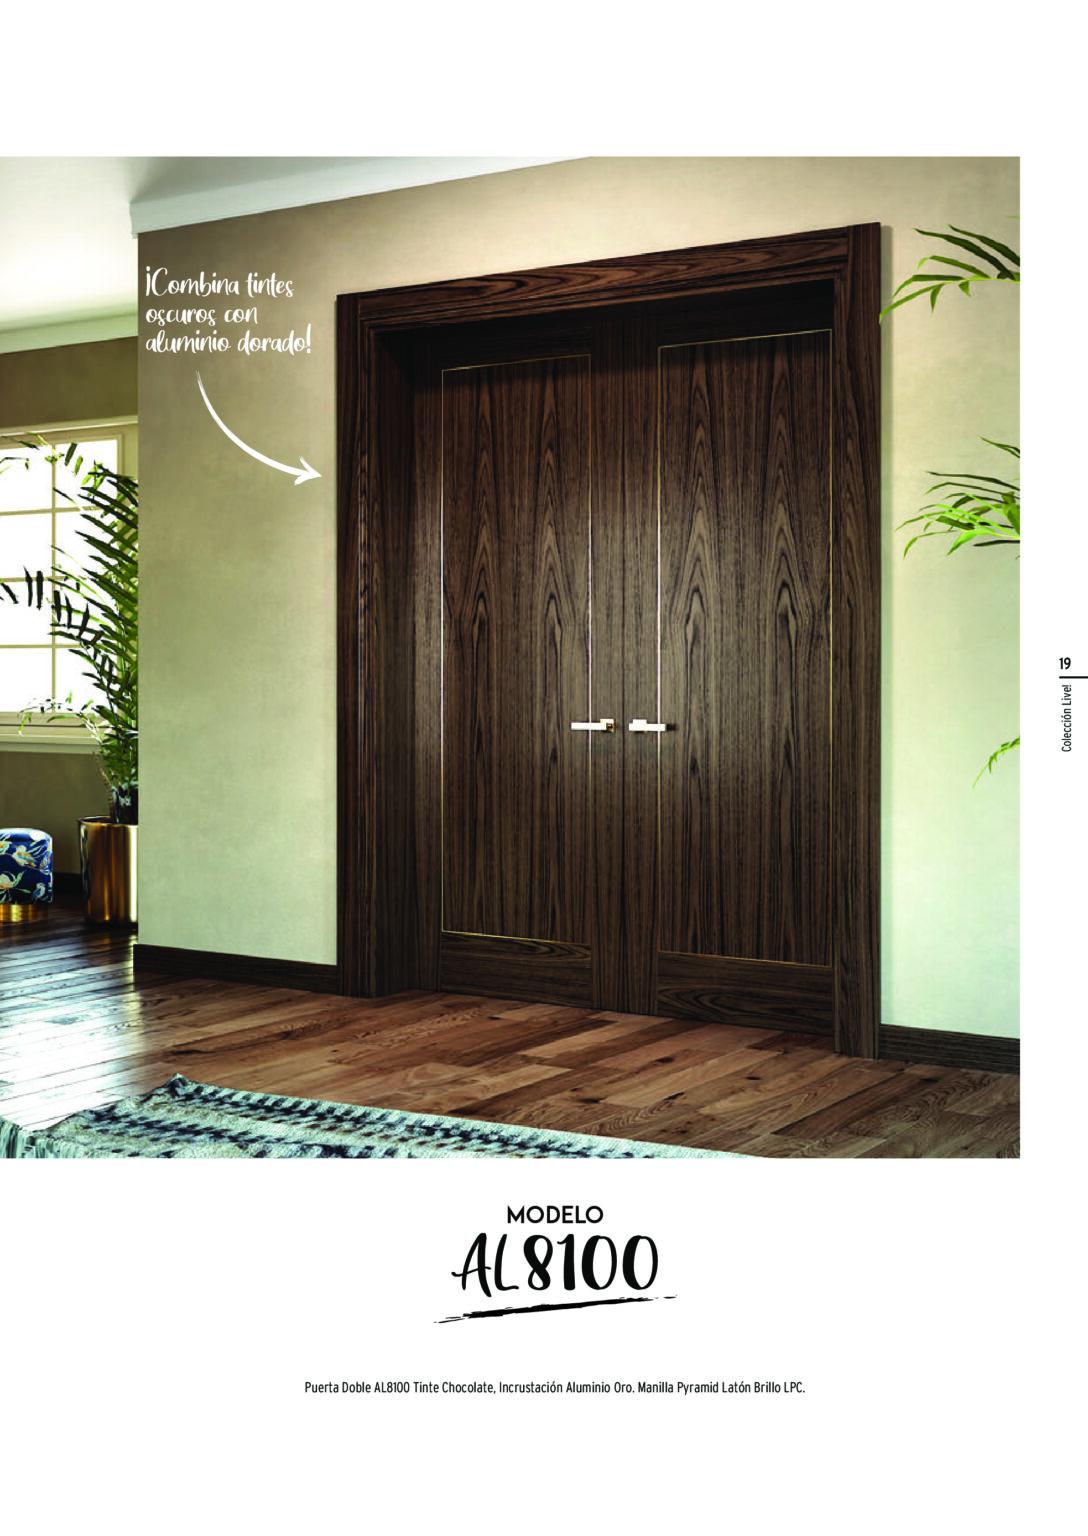 Puerta-Doble-AL8100-Tinte-Chocolate_-Incrustación-Aluminio-Oro.-Manilla-Pyramid-Latón-Brillo-LPC.